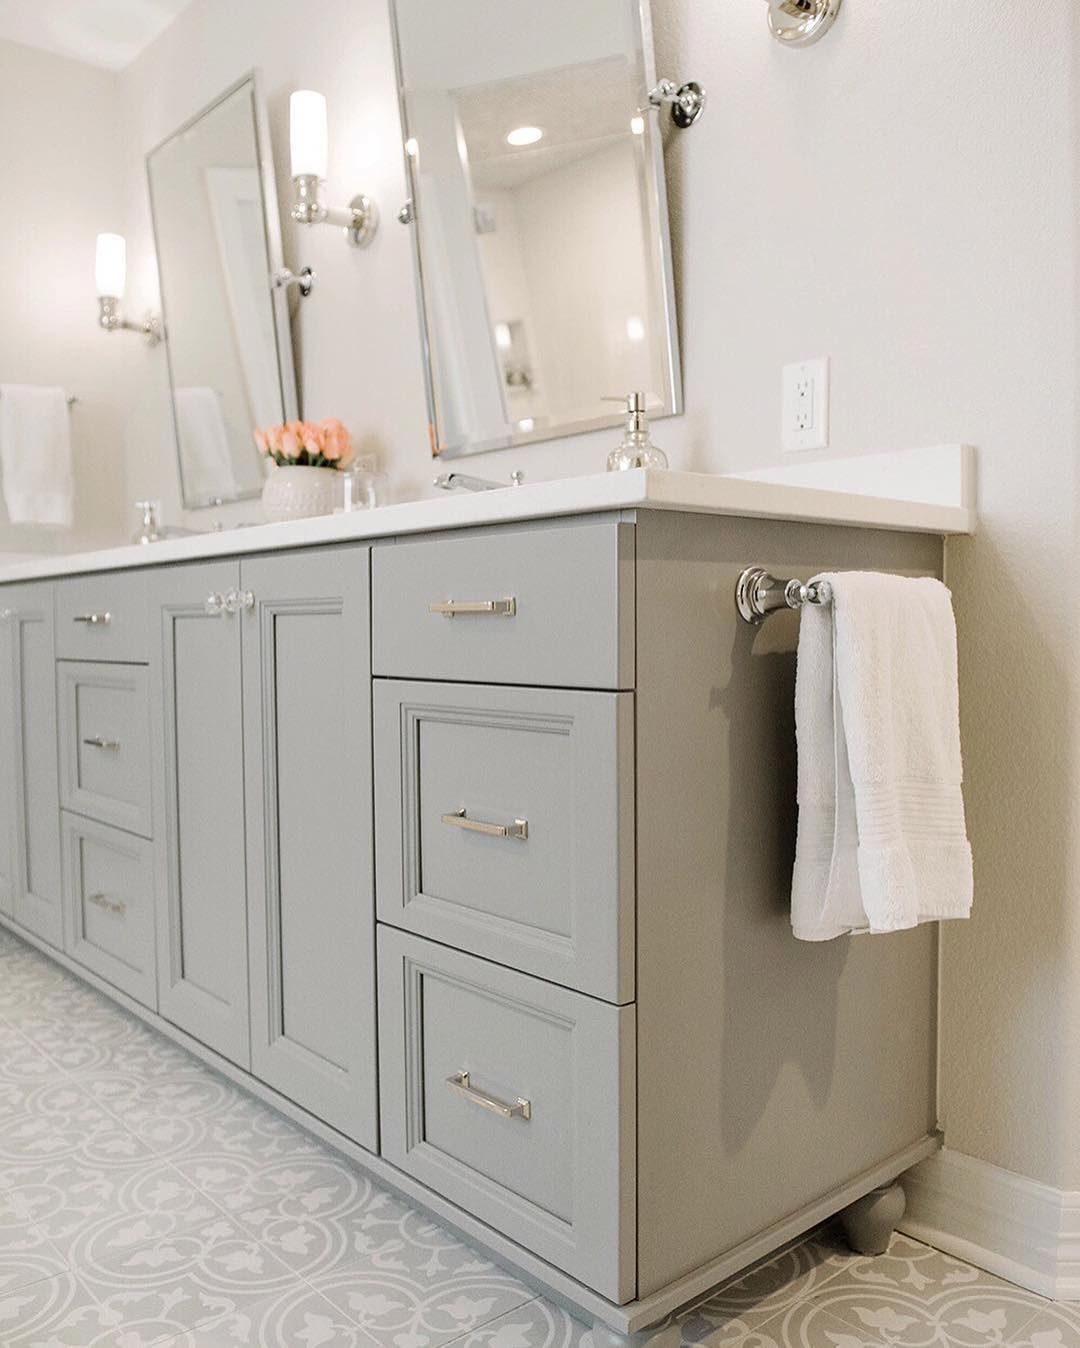 19 Excellent Grey Bathroom Ideas Bathroom Mirror Design Cabinet Paint Colors Painting Cabinets